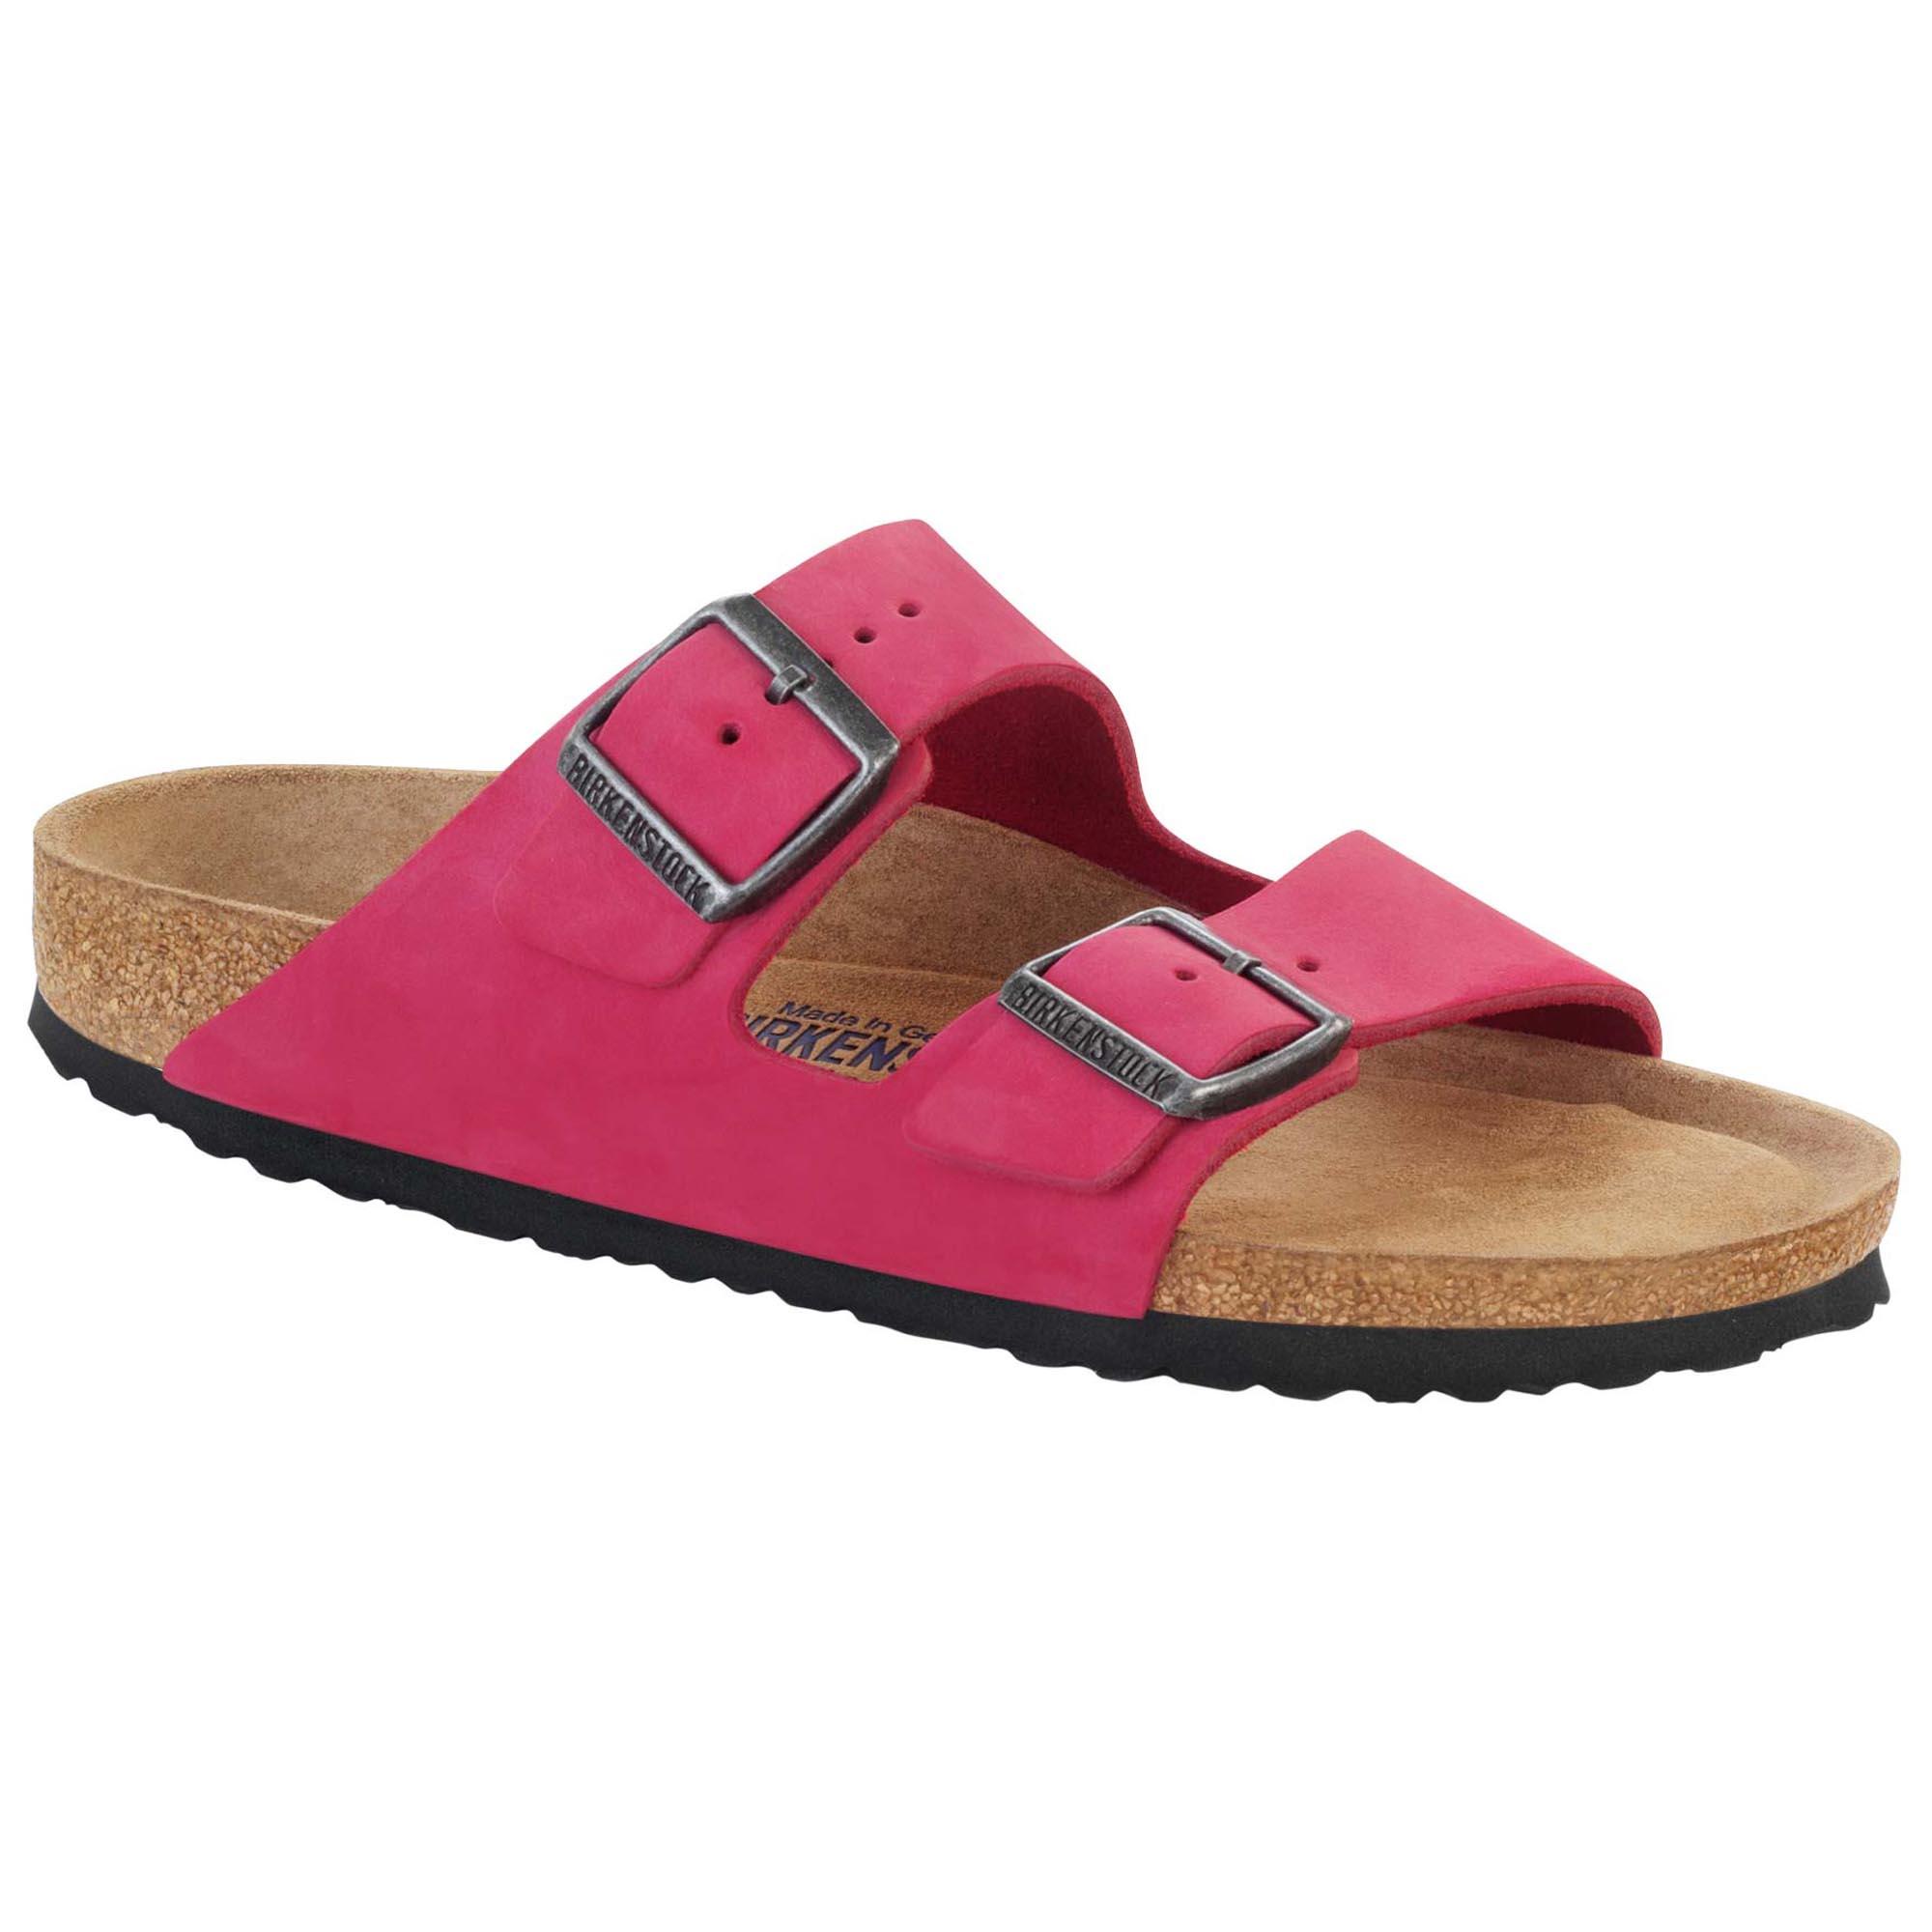 71668b0c398cef Arizona Nubuck Leather Pink